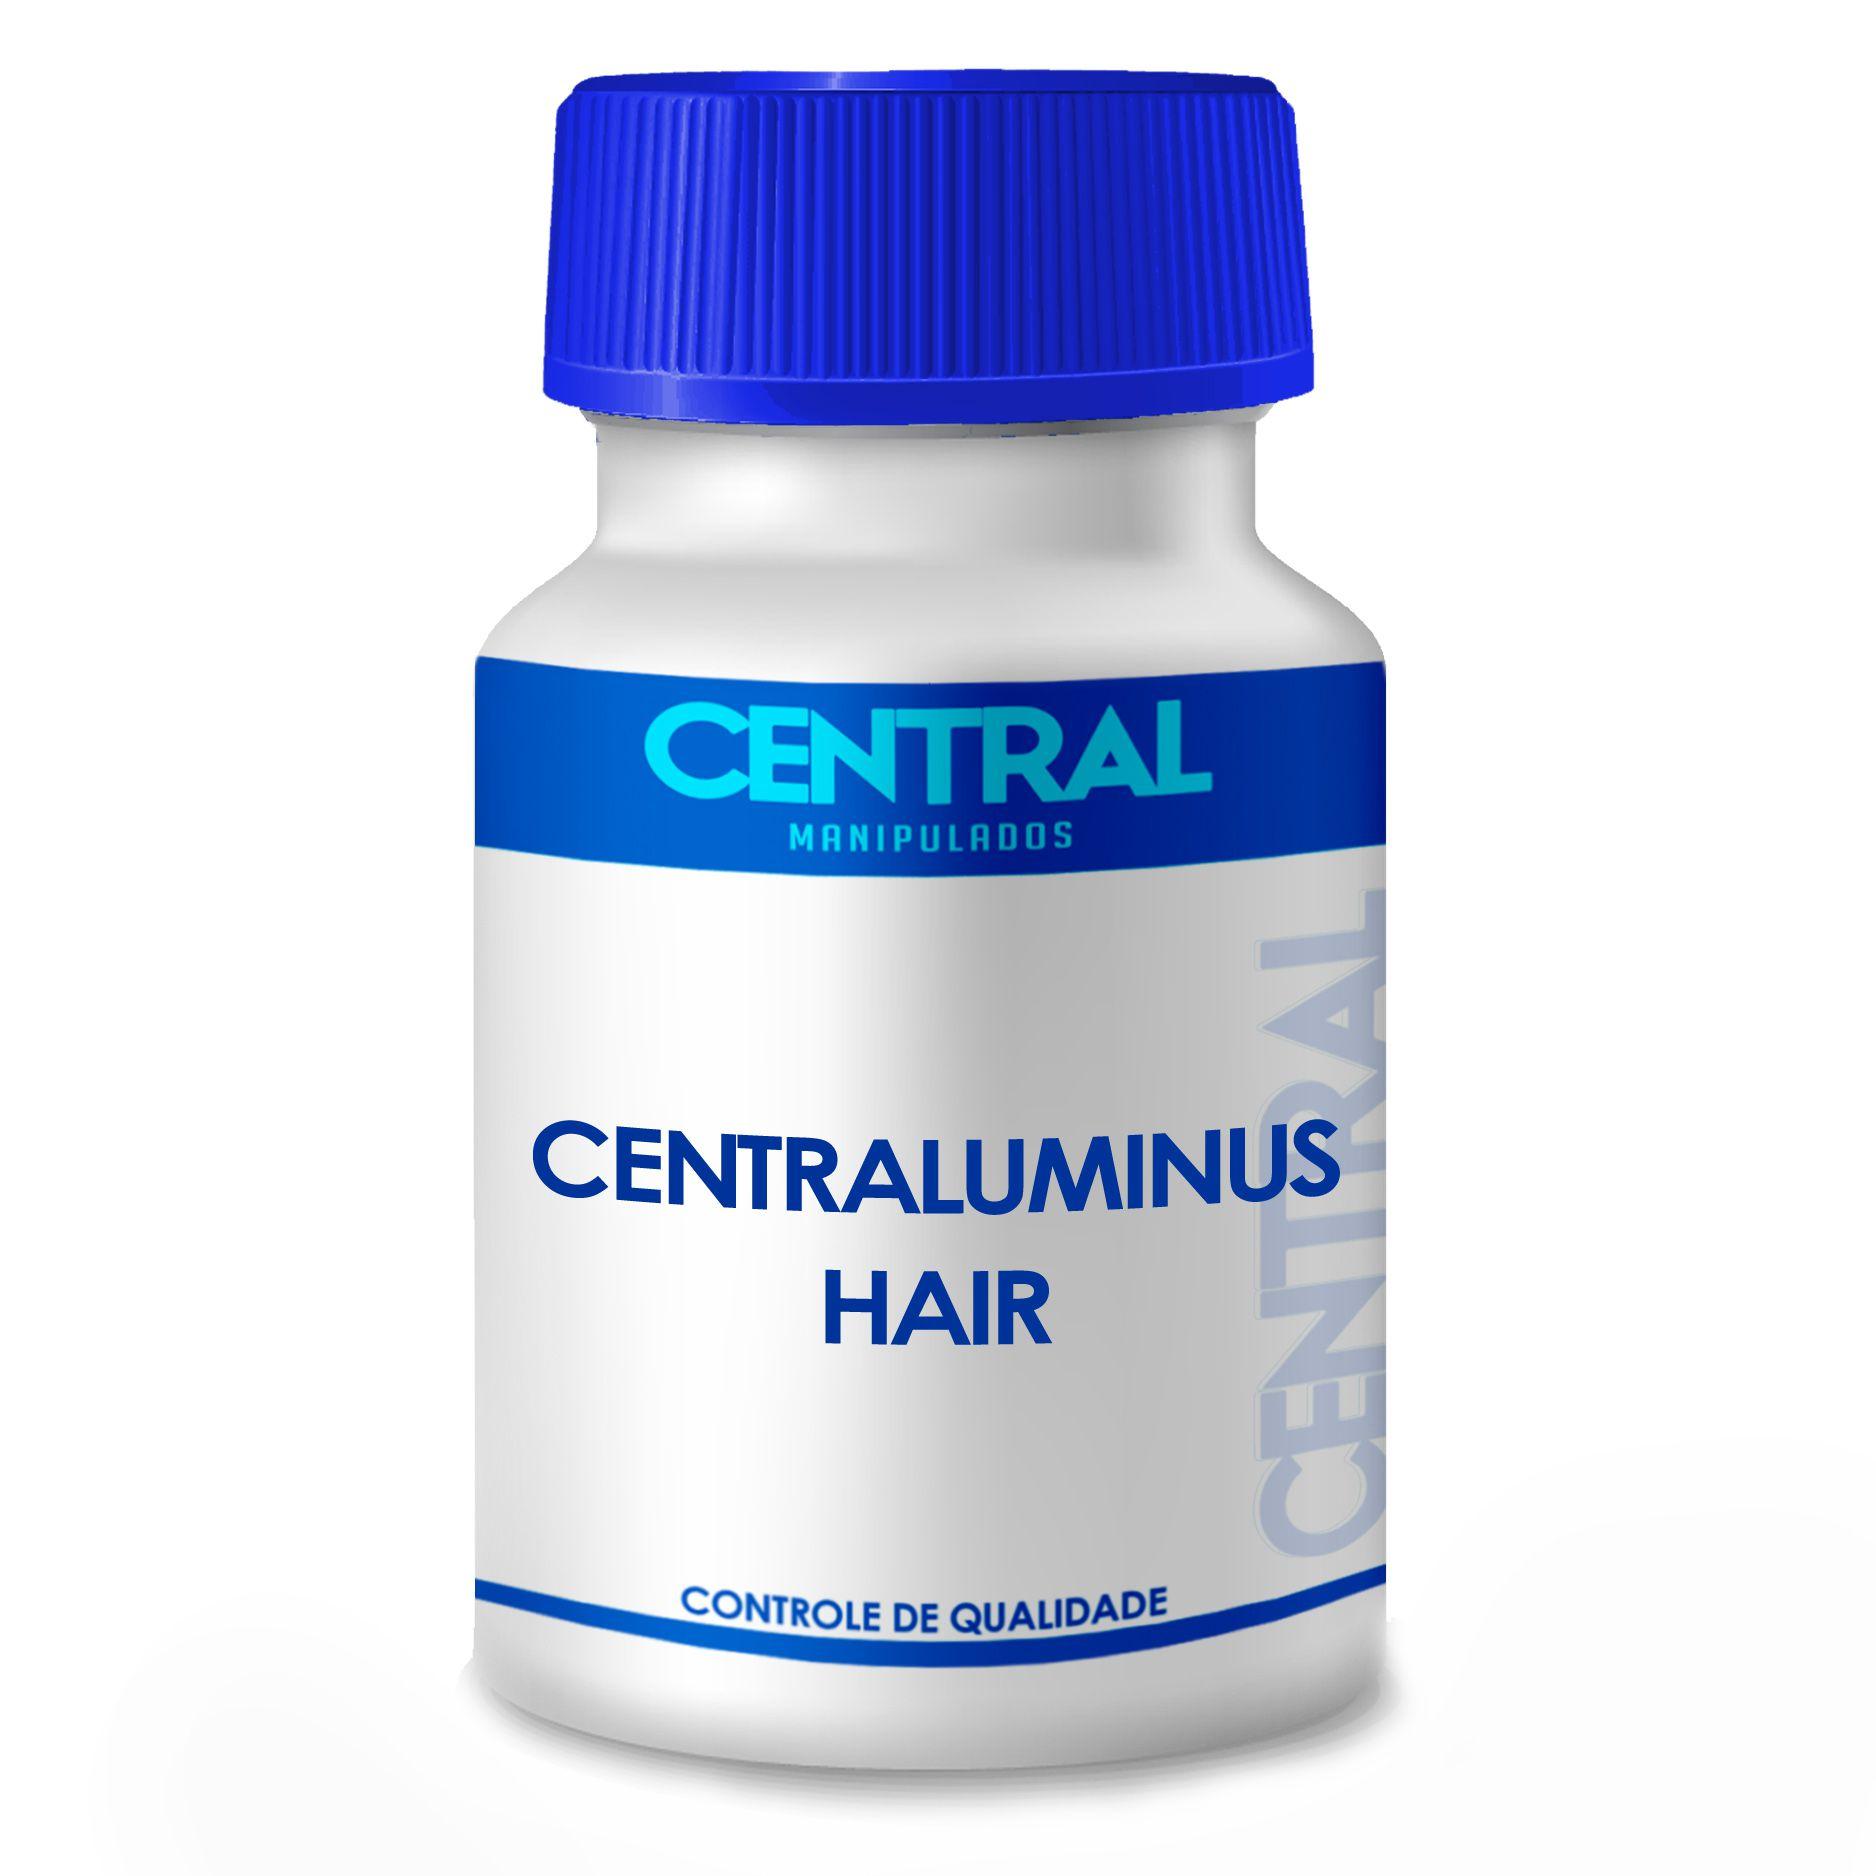 Centraluminus hair